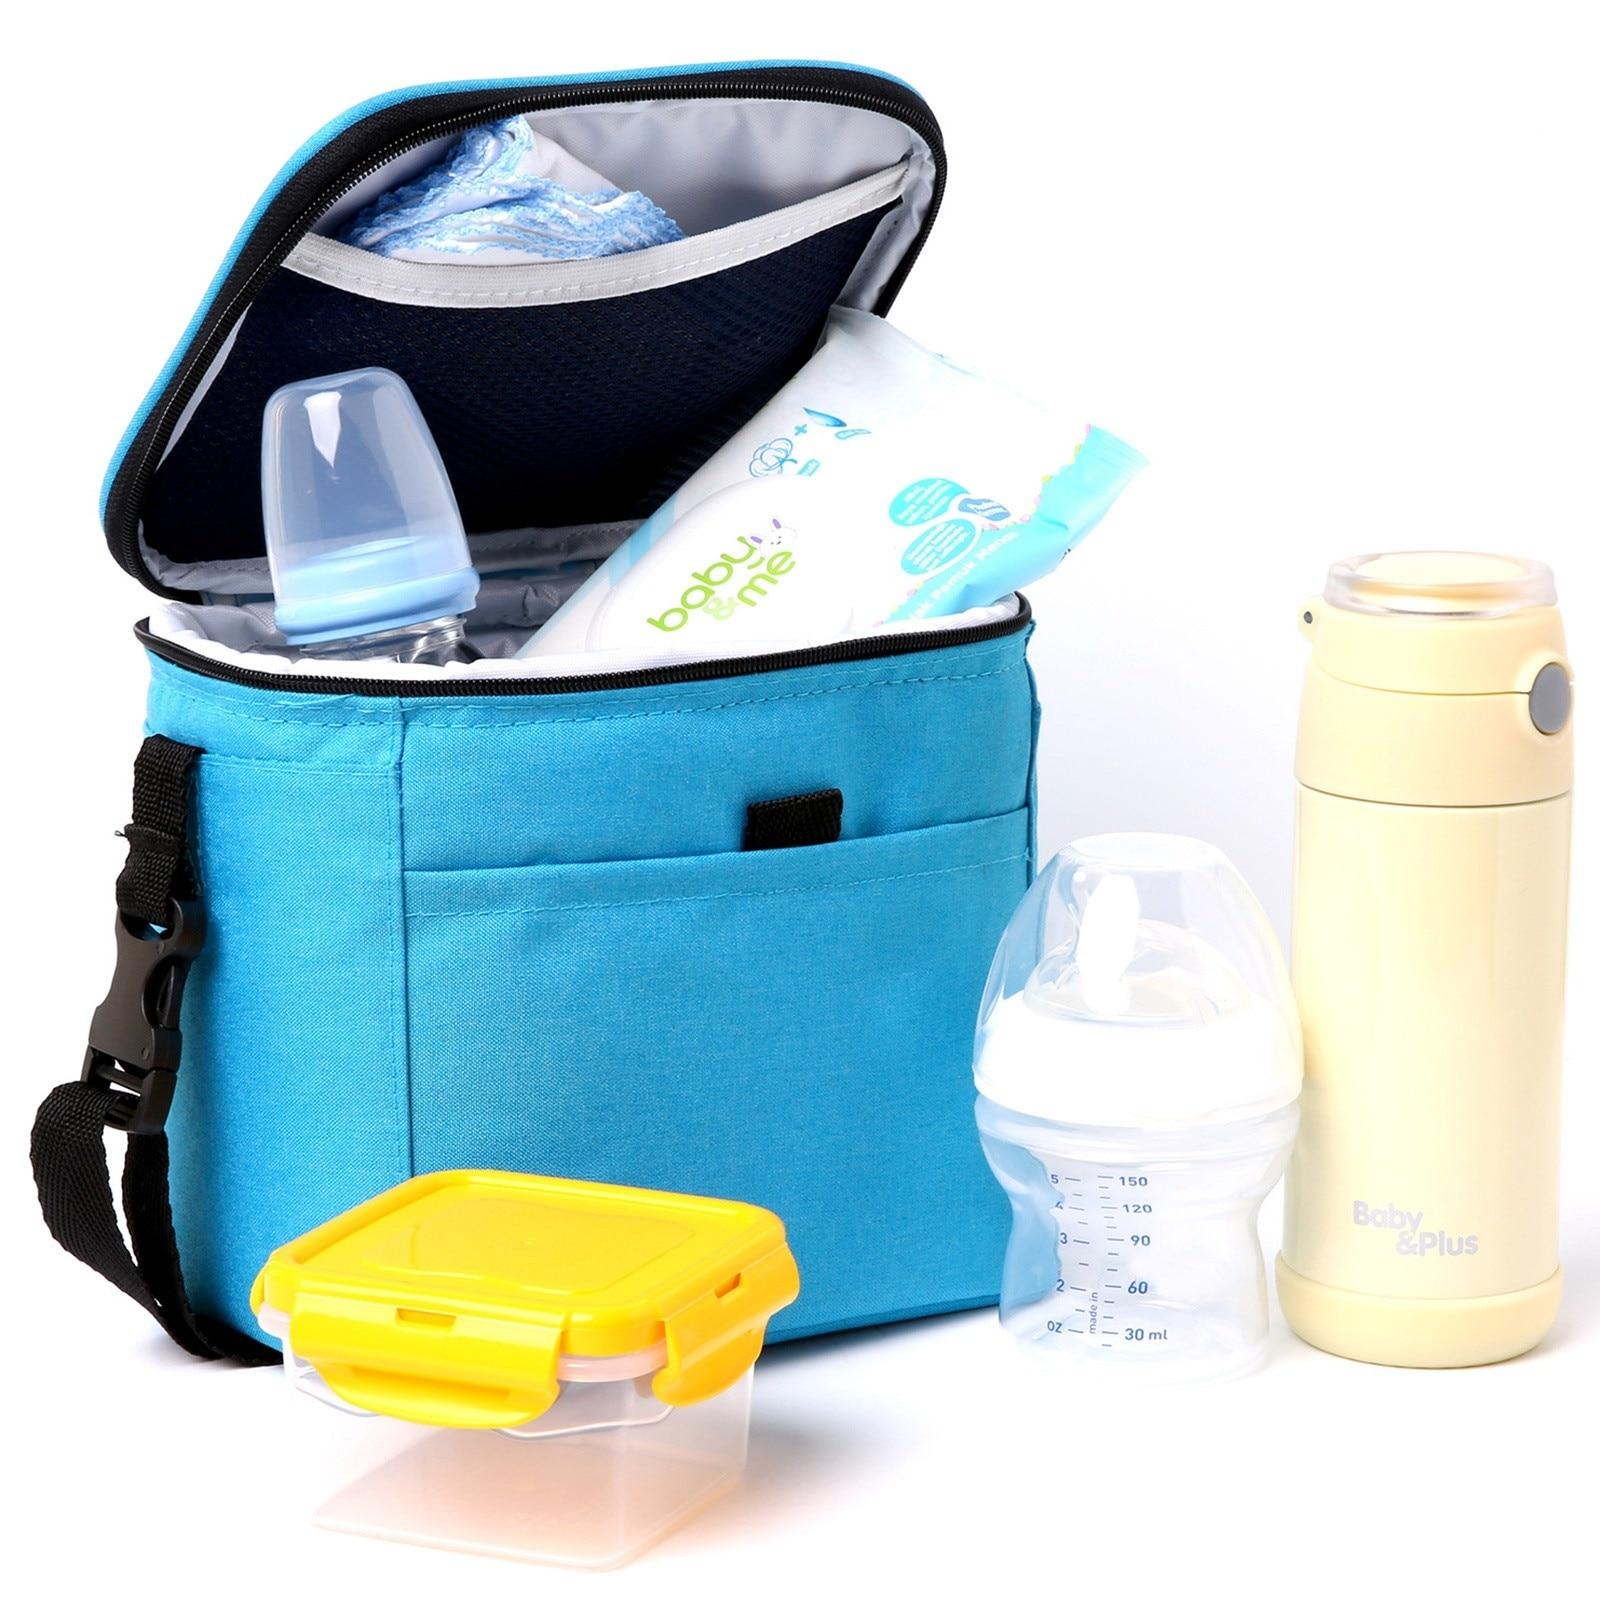 Ebebek Baby Plus Insulated Food And Baby Bottle Bag